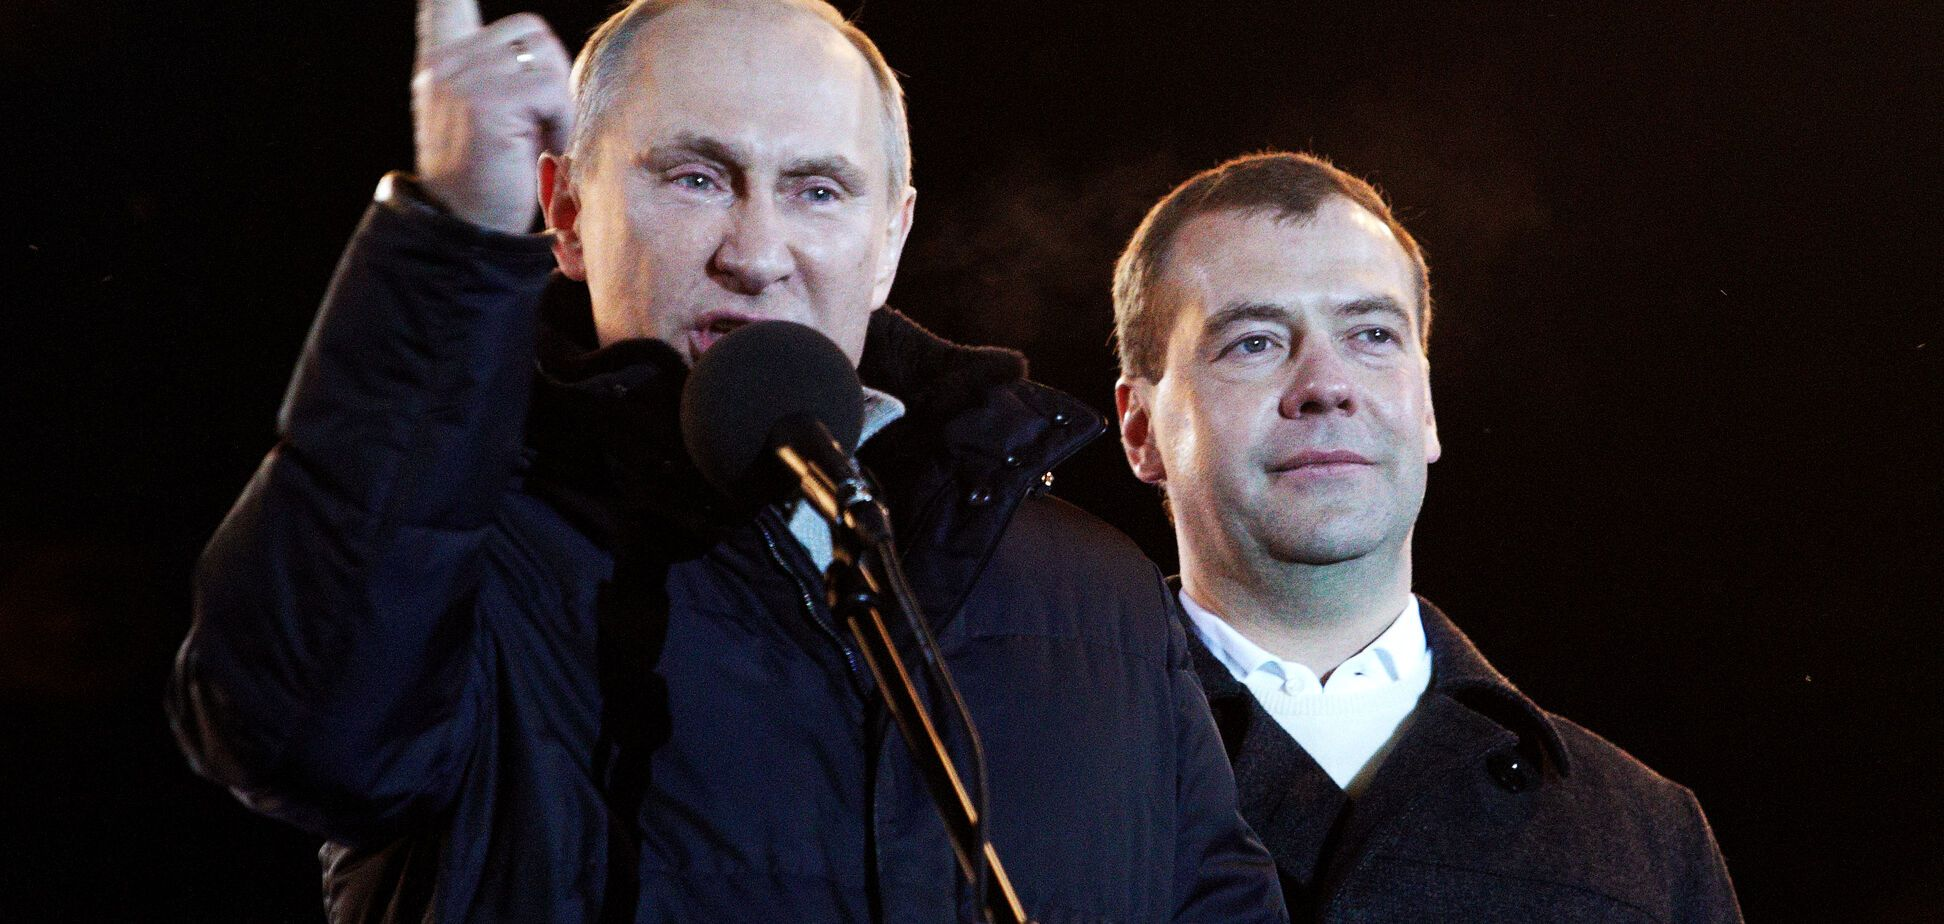 'Путин крайне уязвим': российский юрист заявил, что президент нелегитимен